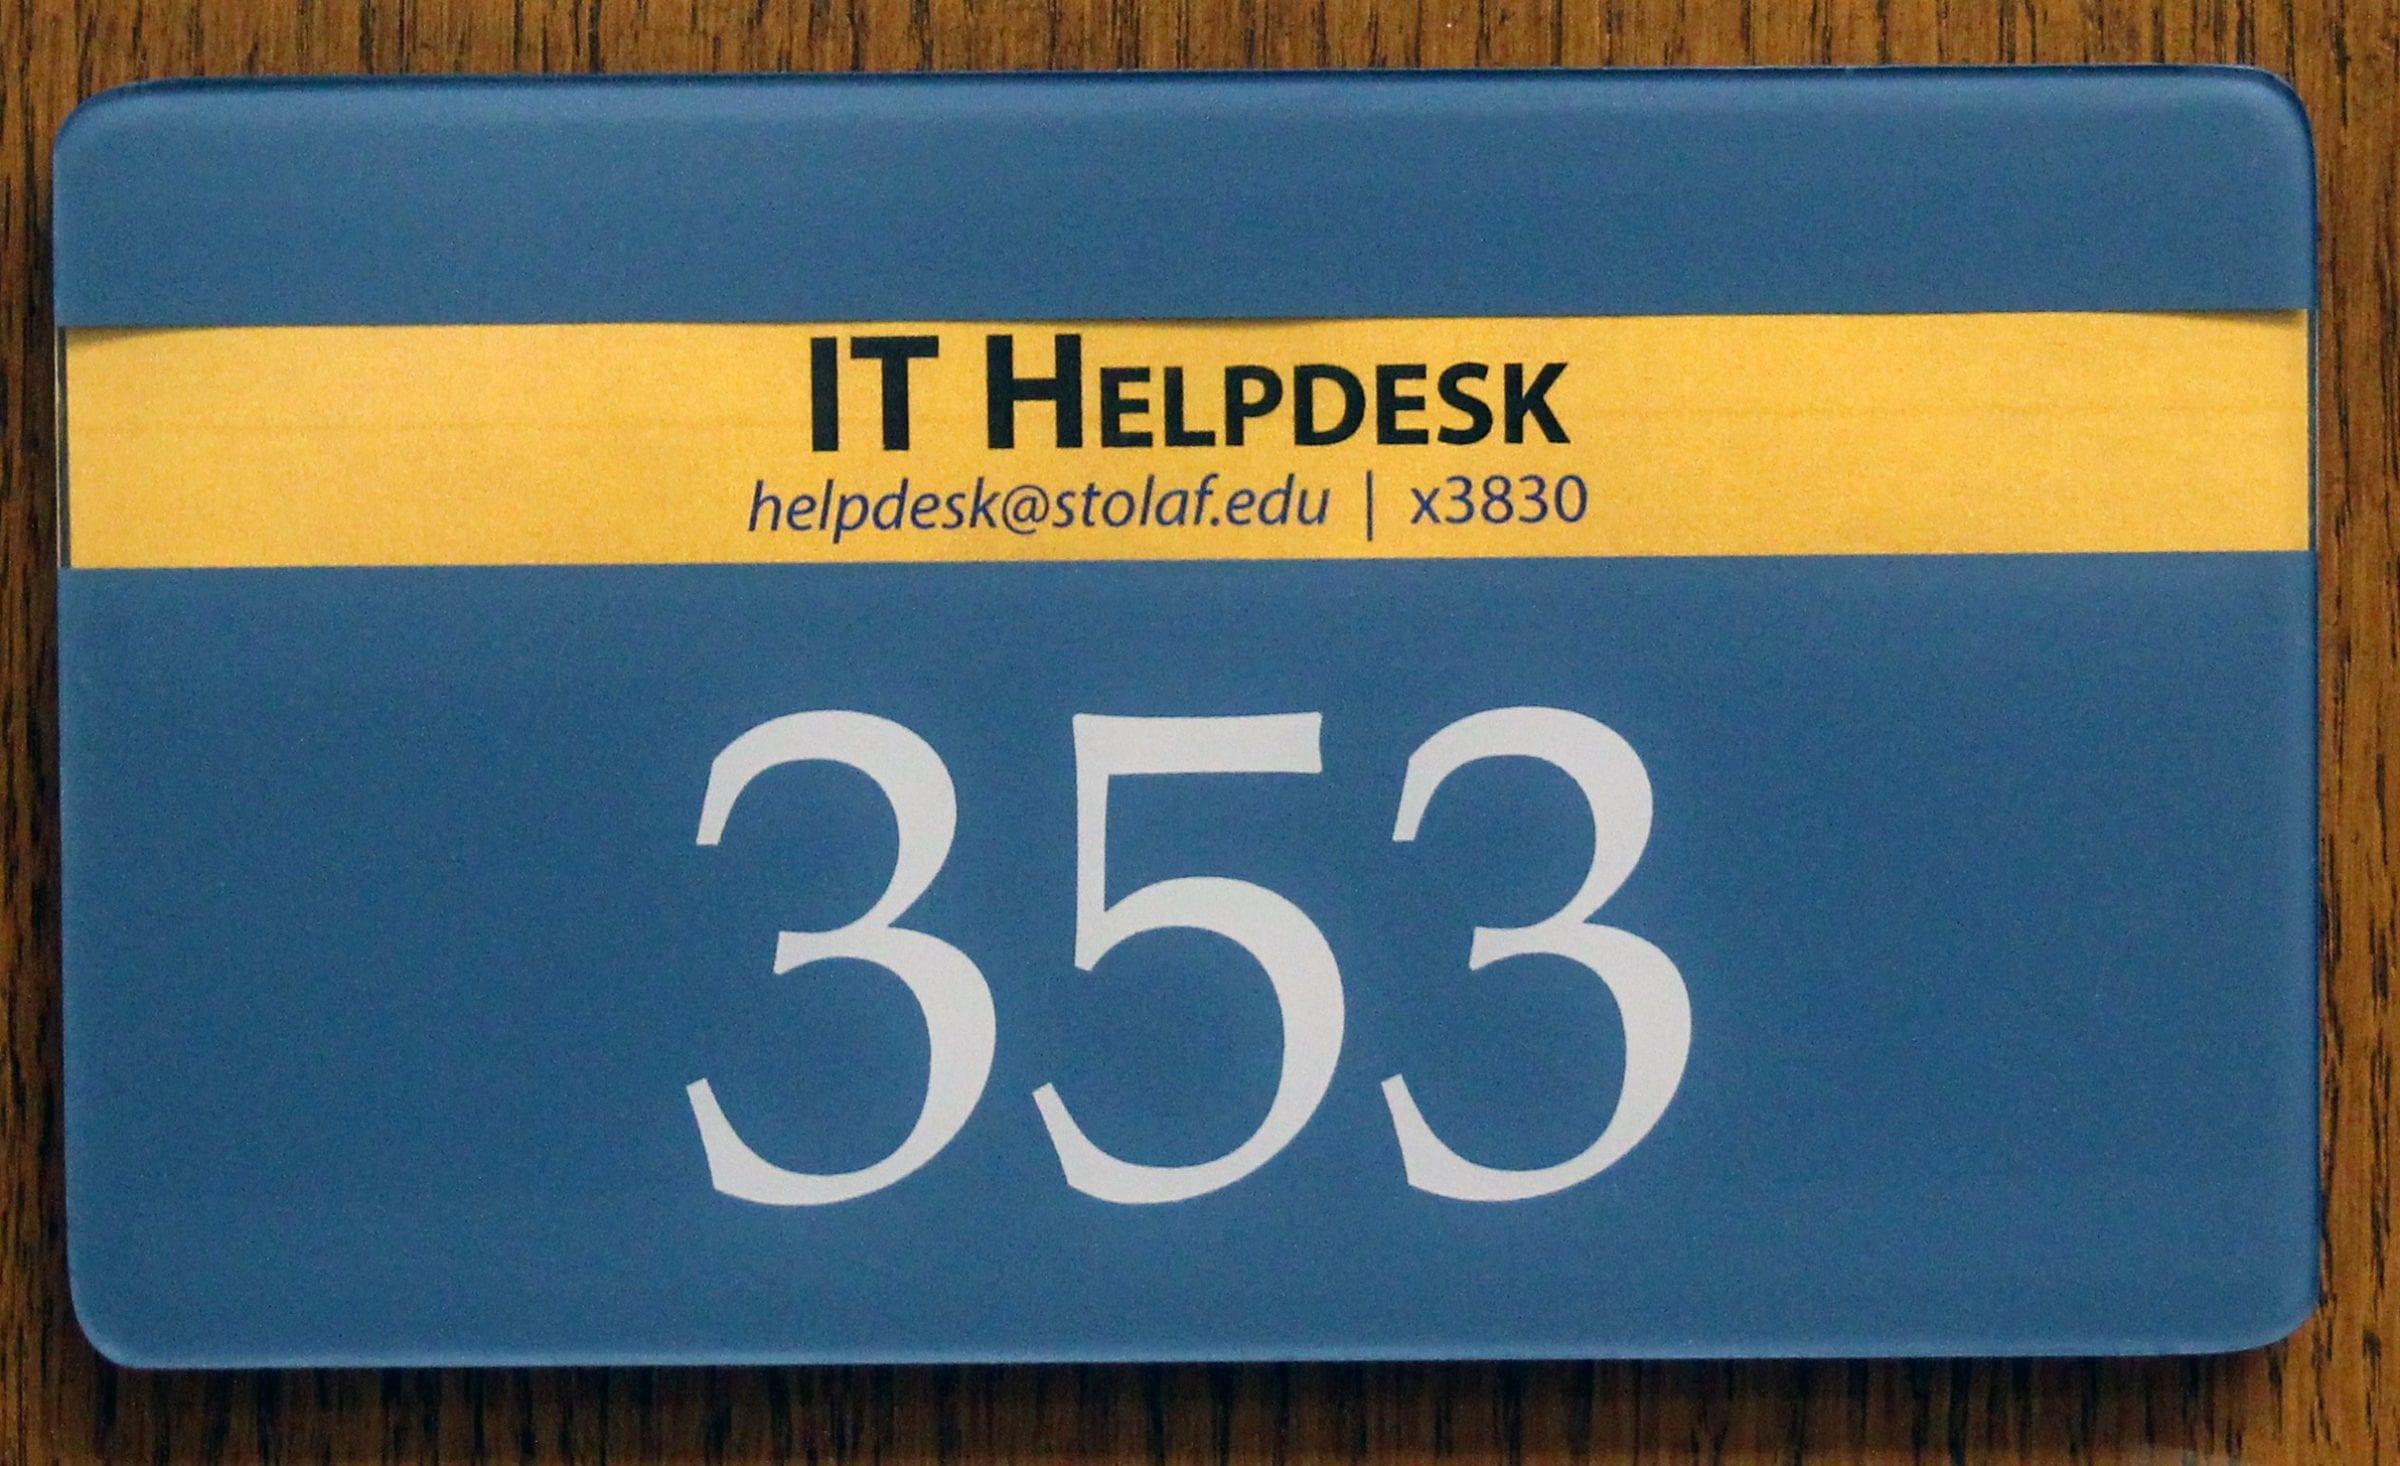 Helpdesk RML 353